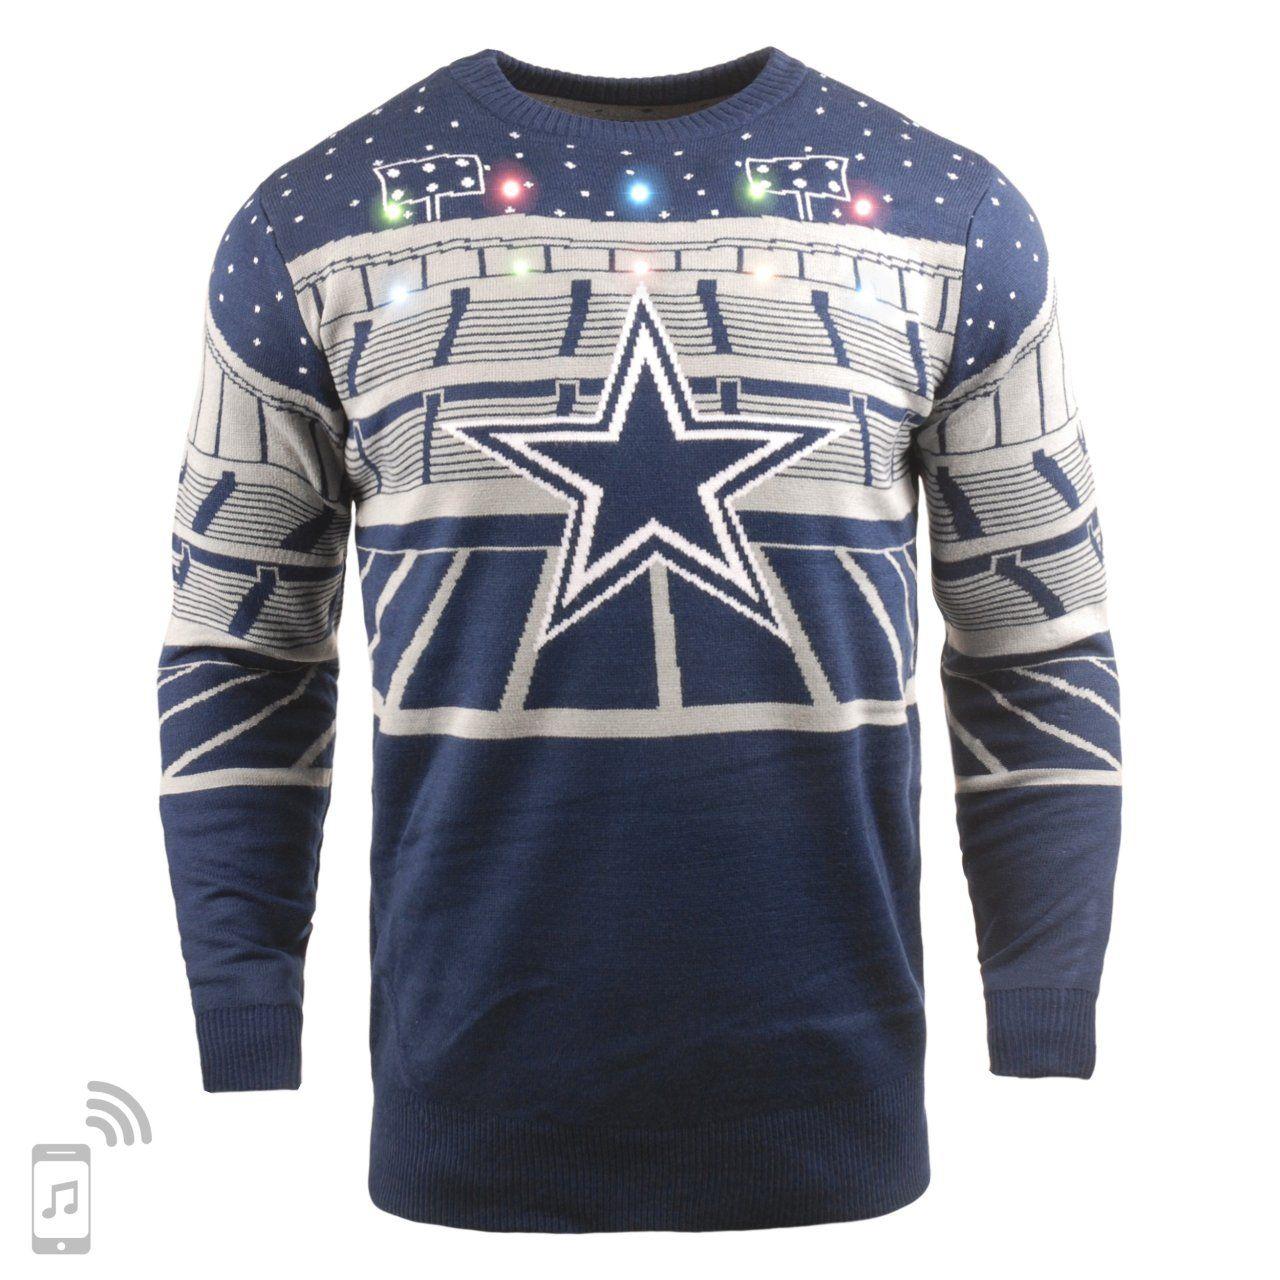 amfoo - NFL Ugly Sweater XMAS LED Pullover - Dallas Cowboys